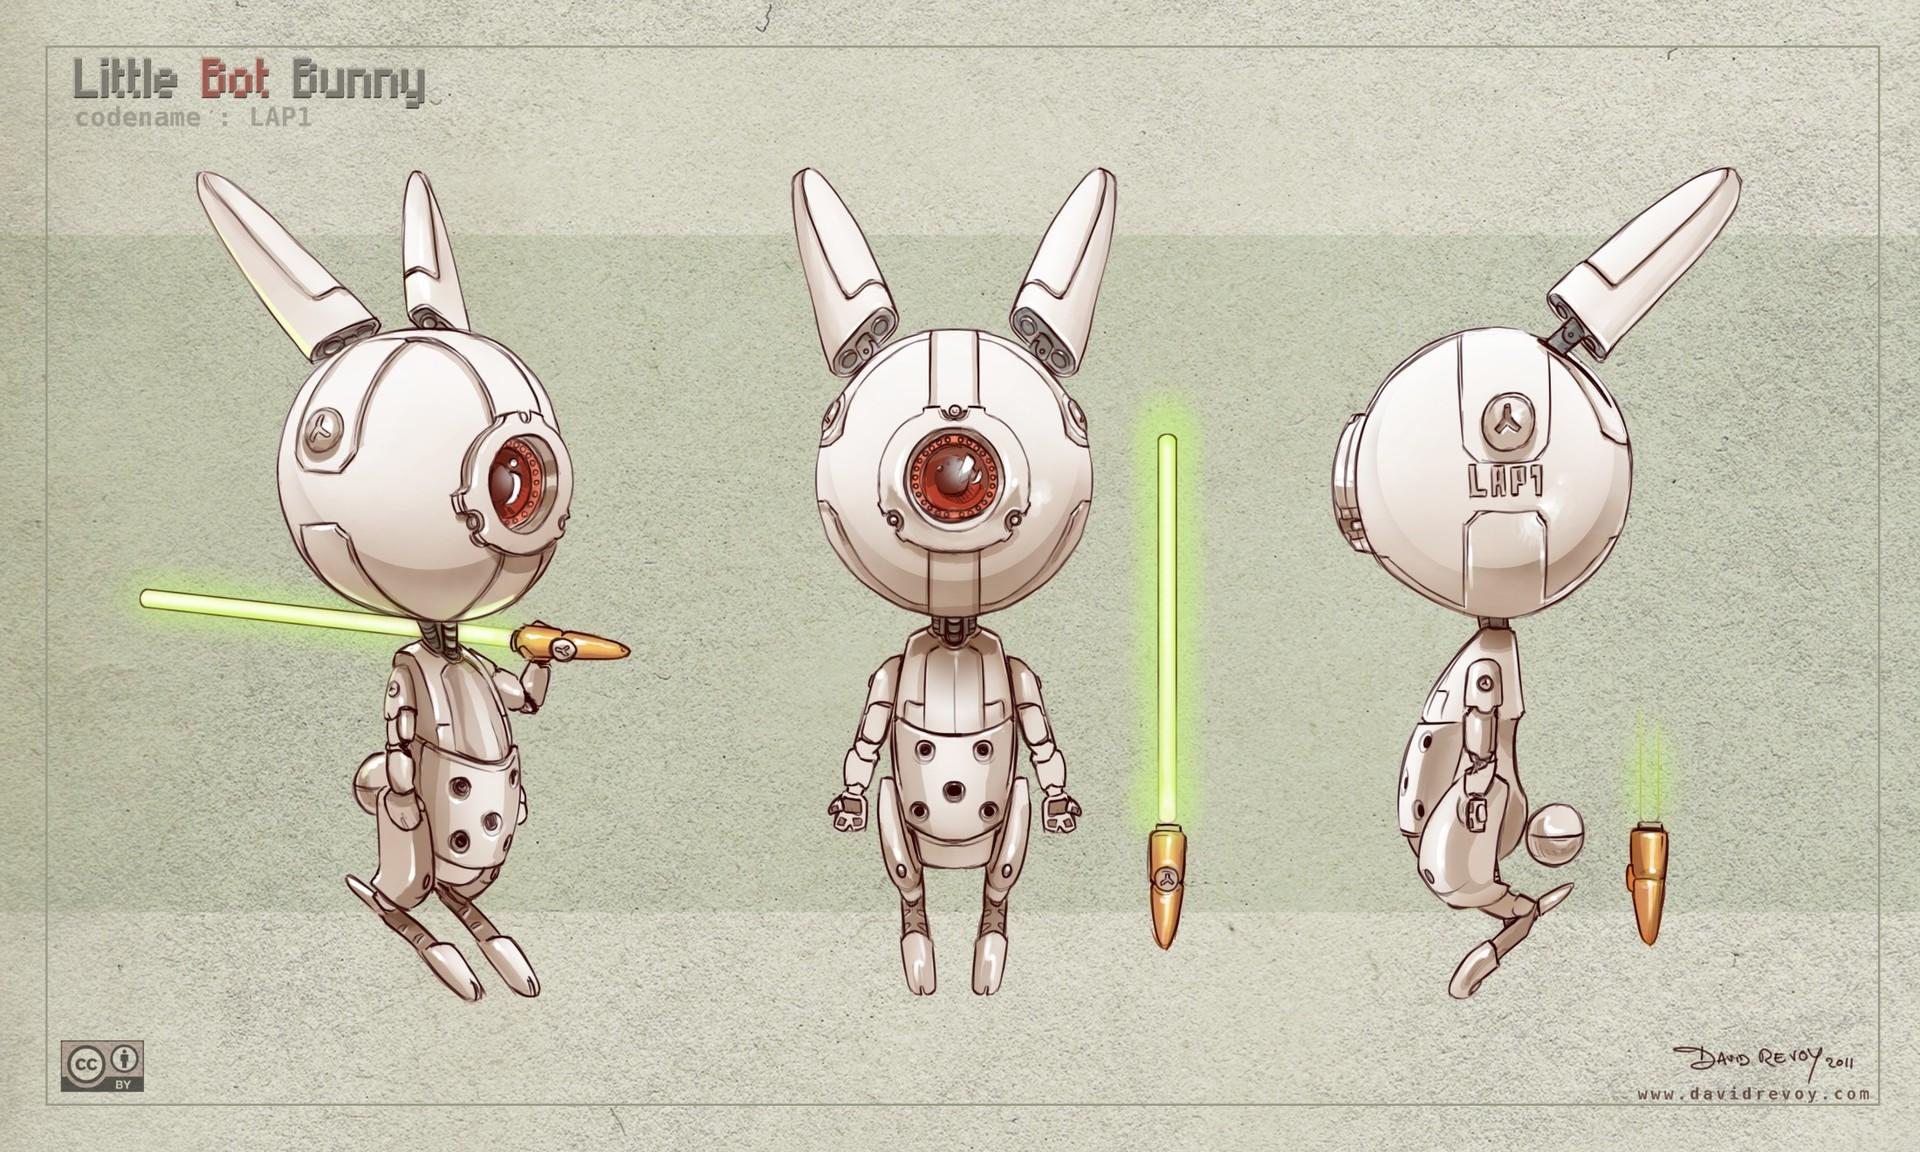 Lucas falcao littlebotbunny davidrevoy color